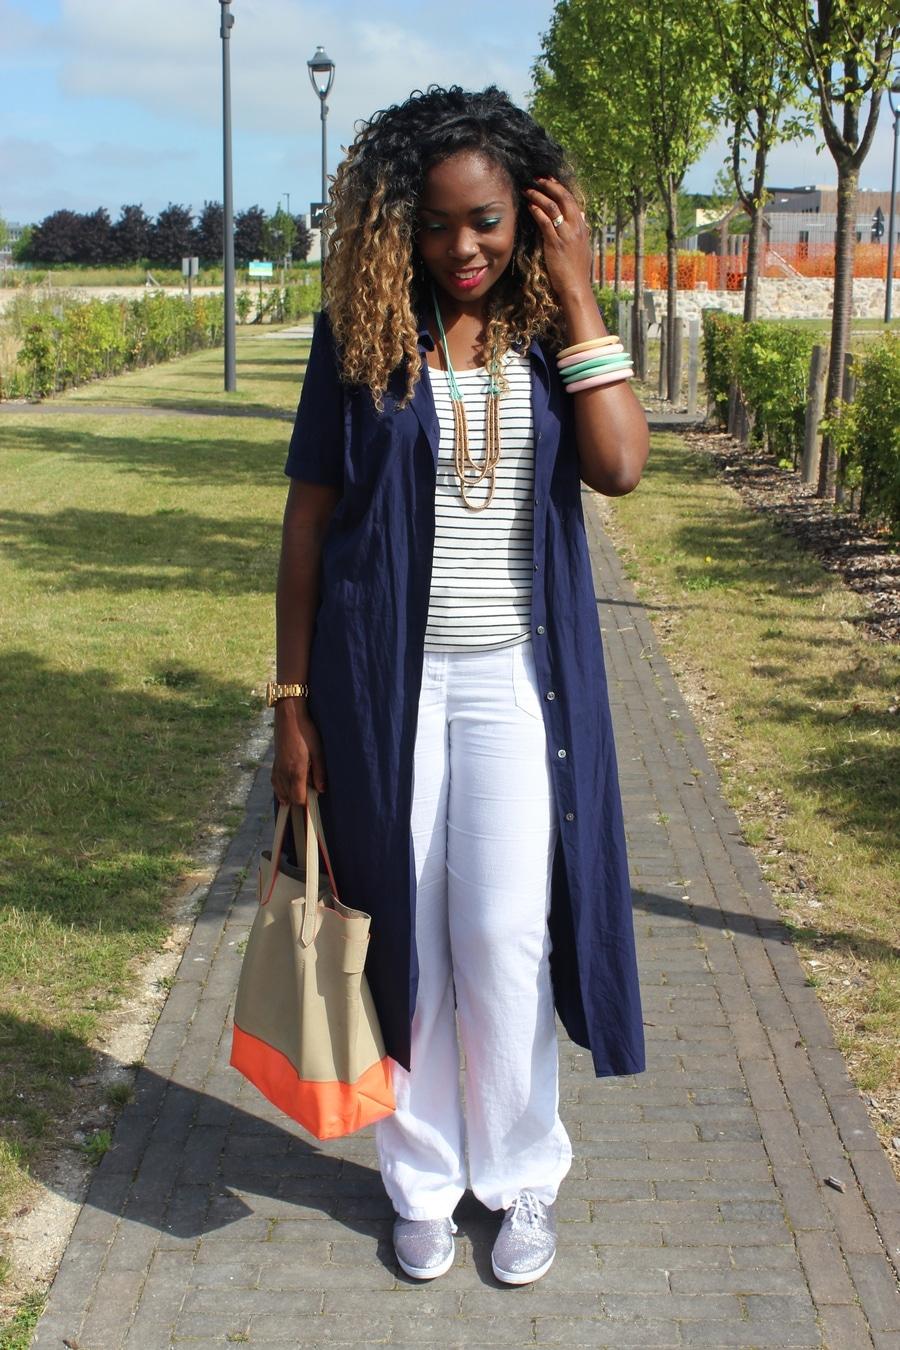 Comment porter les chaussures blanches? Personal Shopper